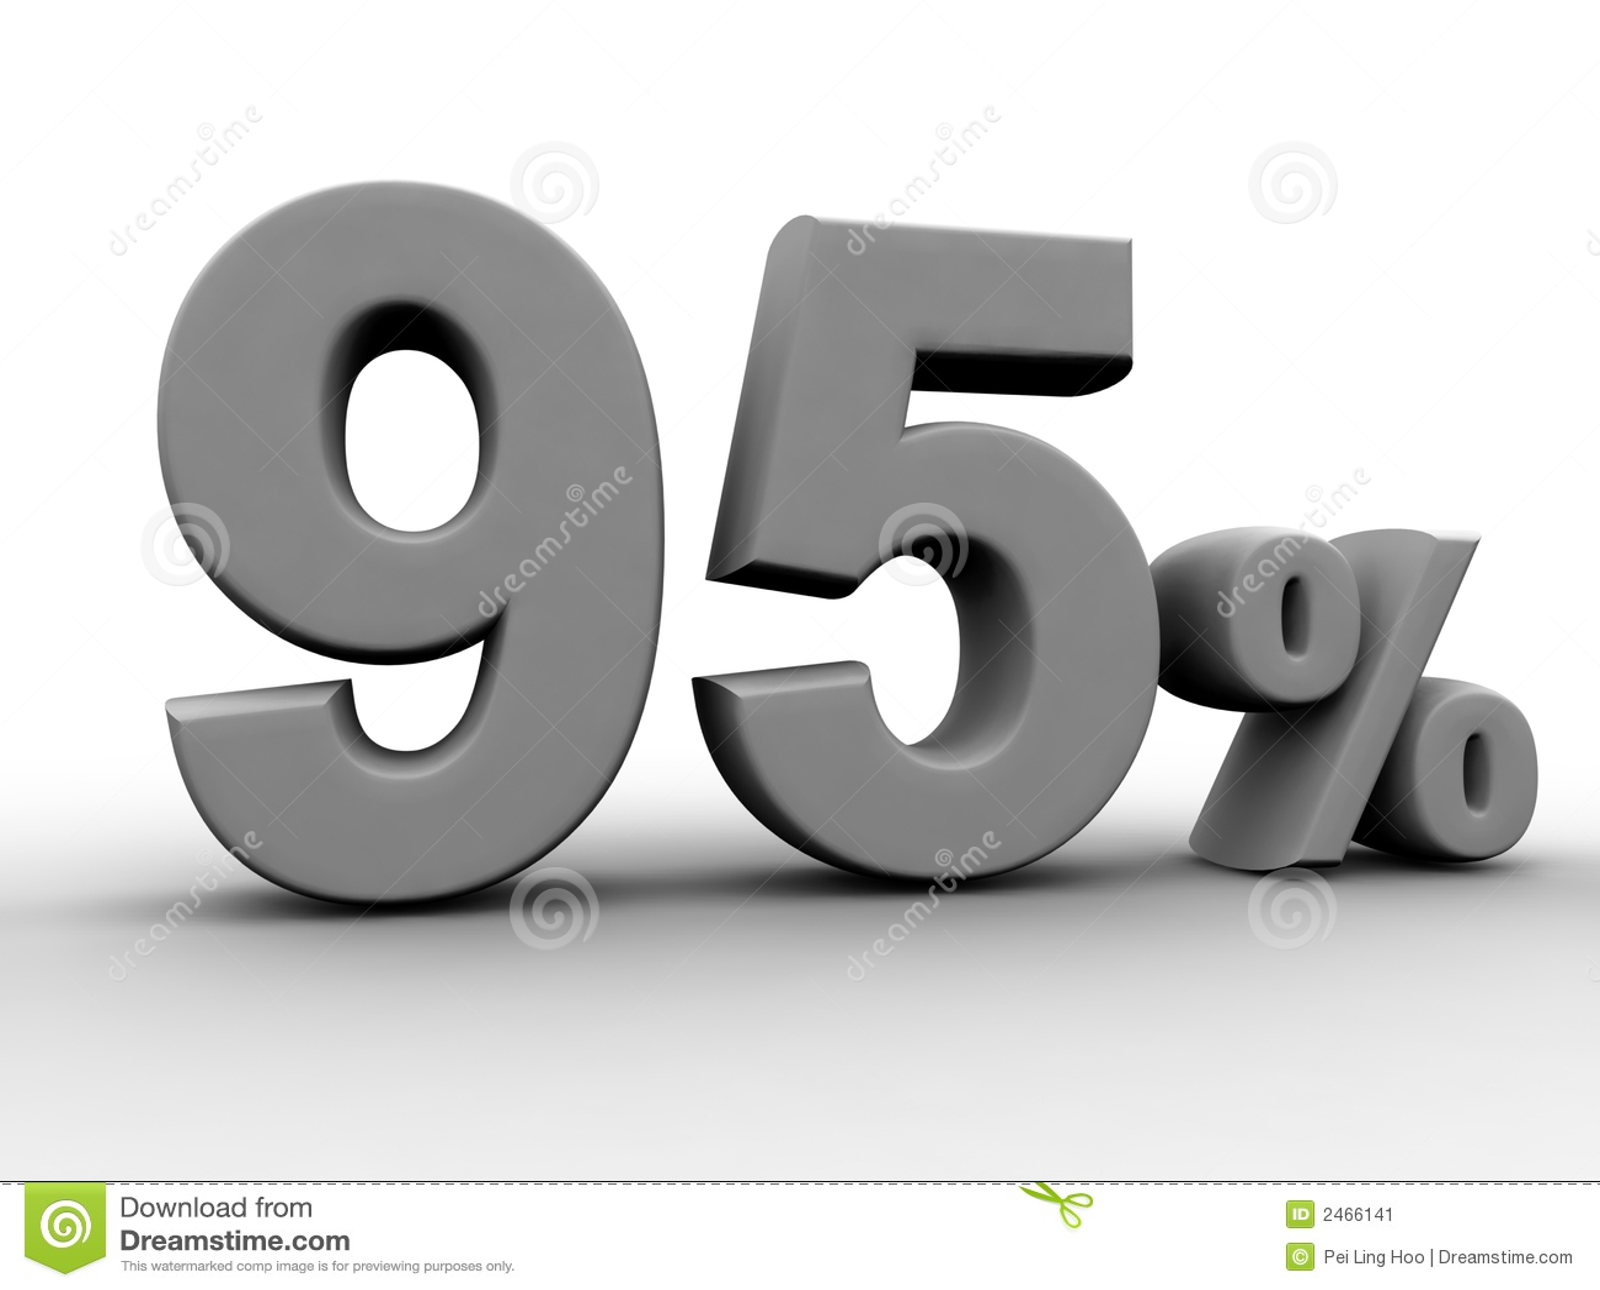 95 Percent Stock Image